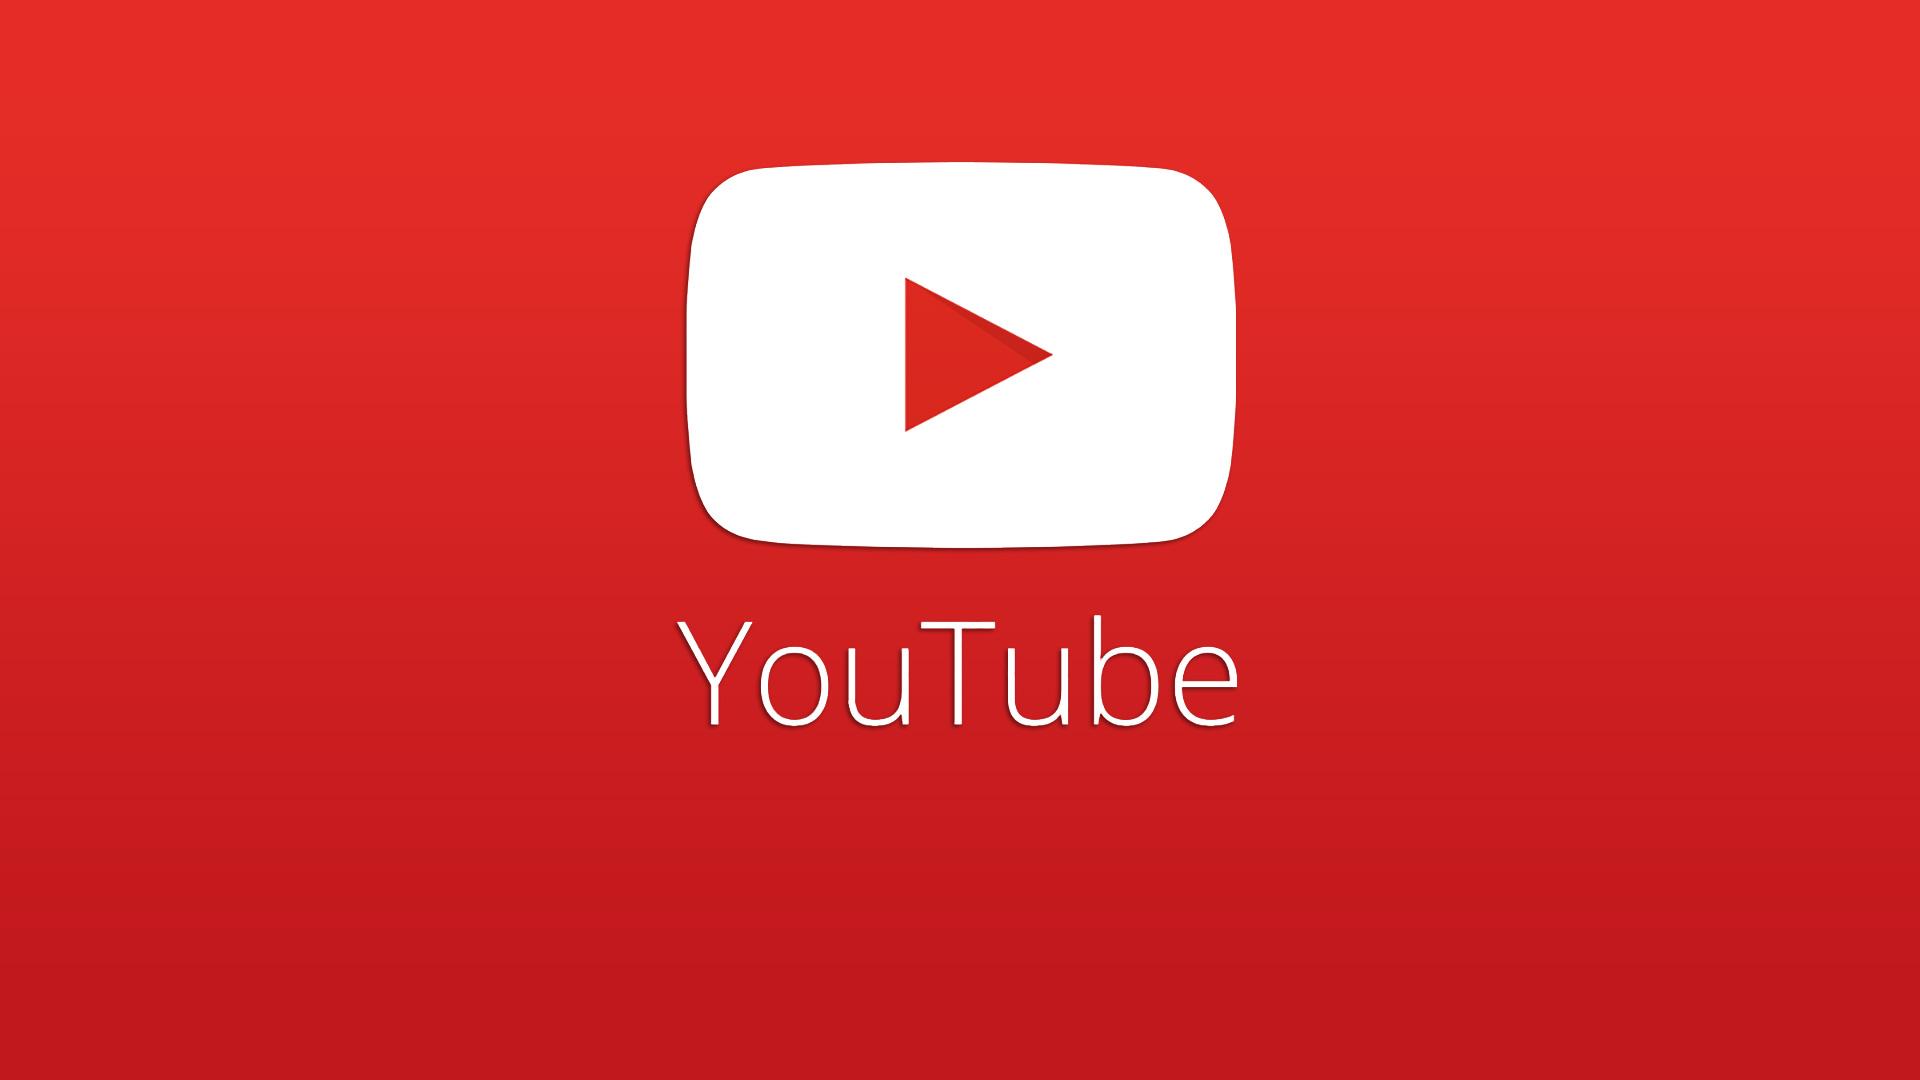 youtube-logo-name-1920_1557193121030.jpg